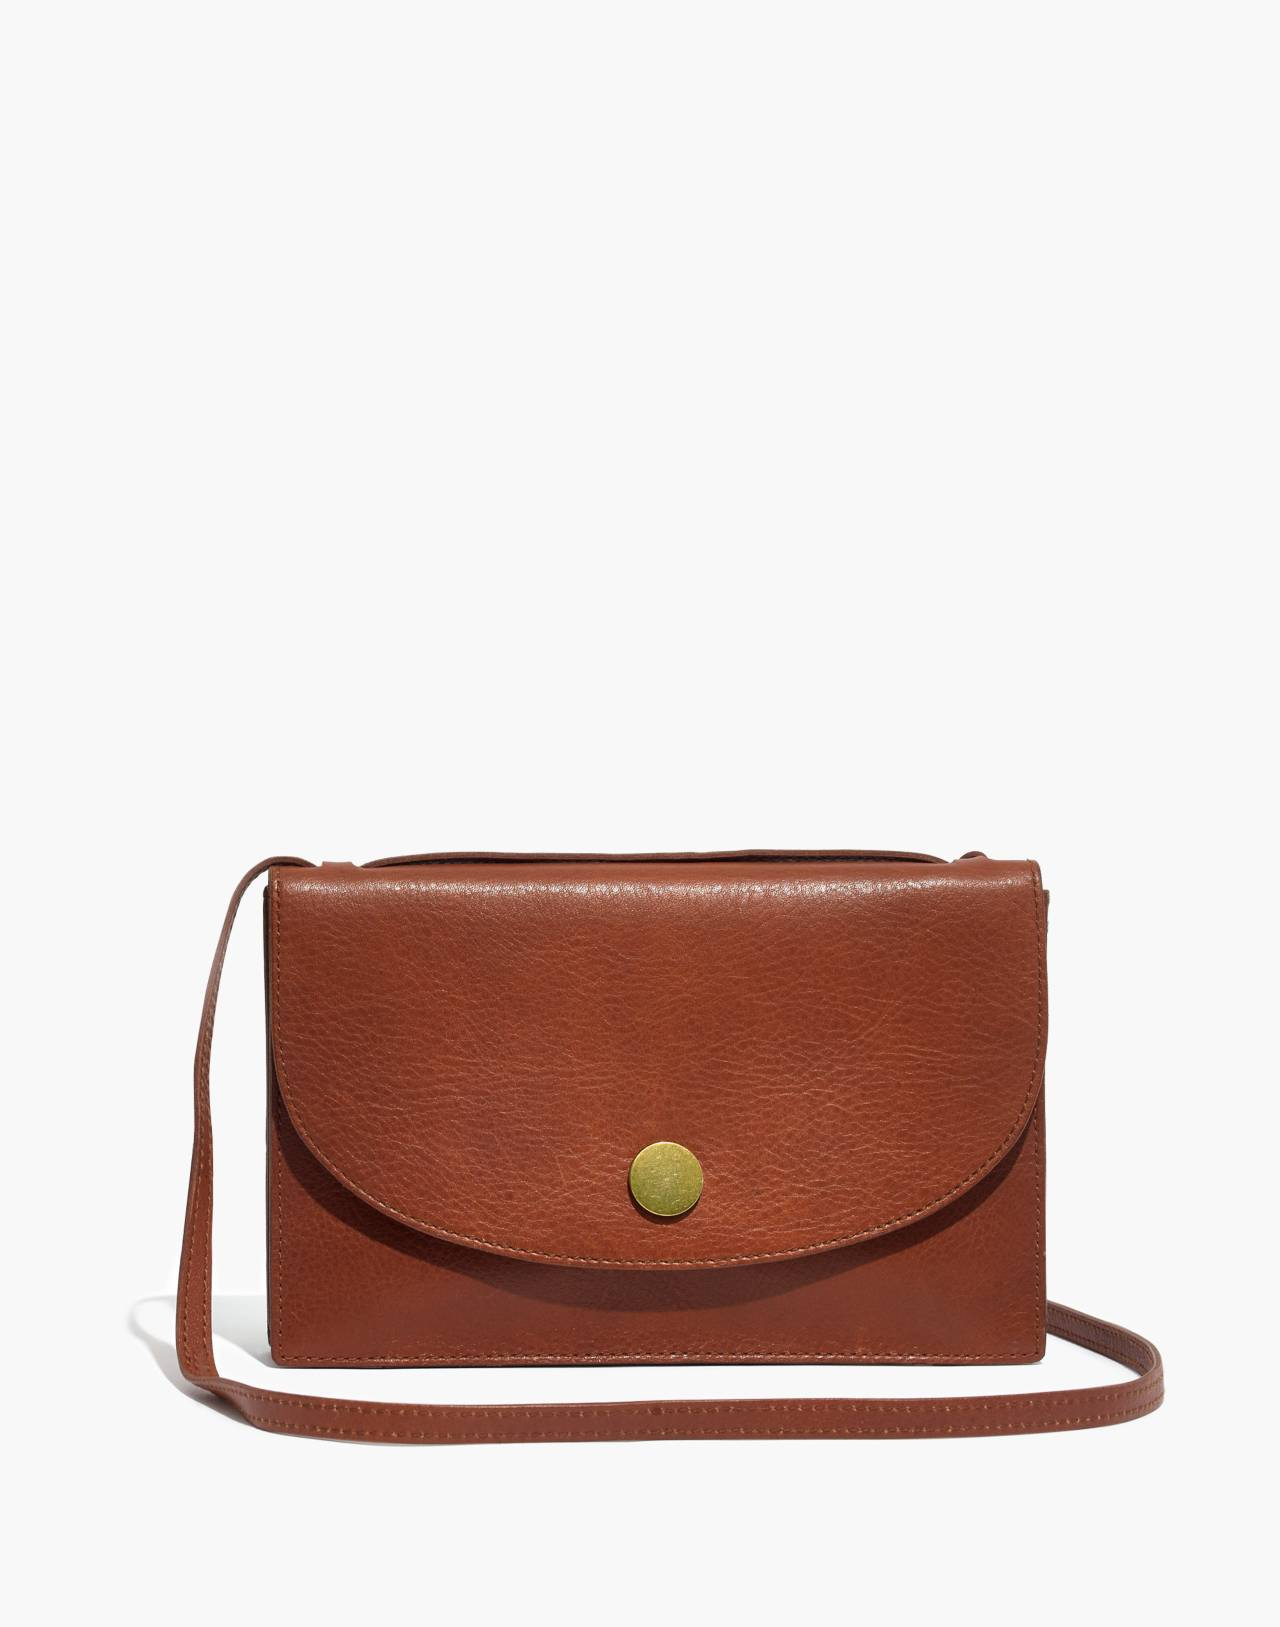 The Slim Convertible Bag in english saddle image 1